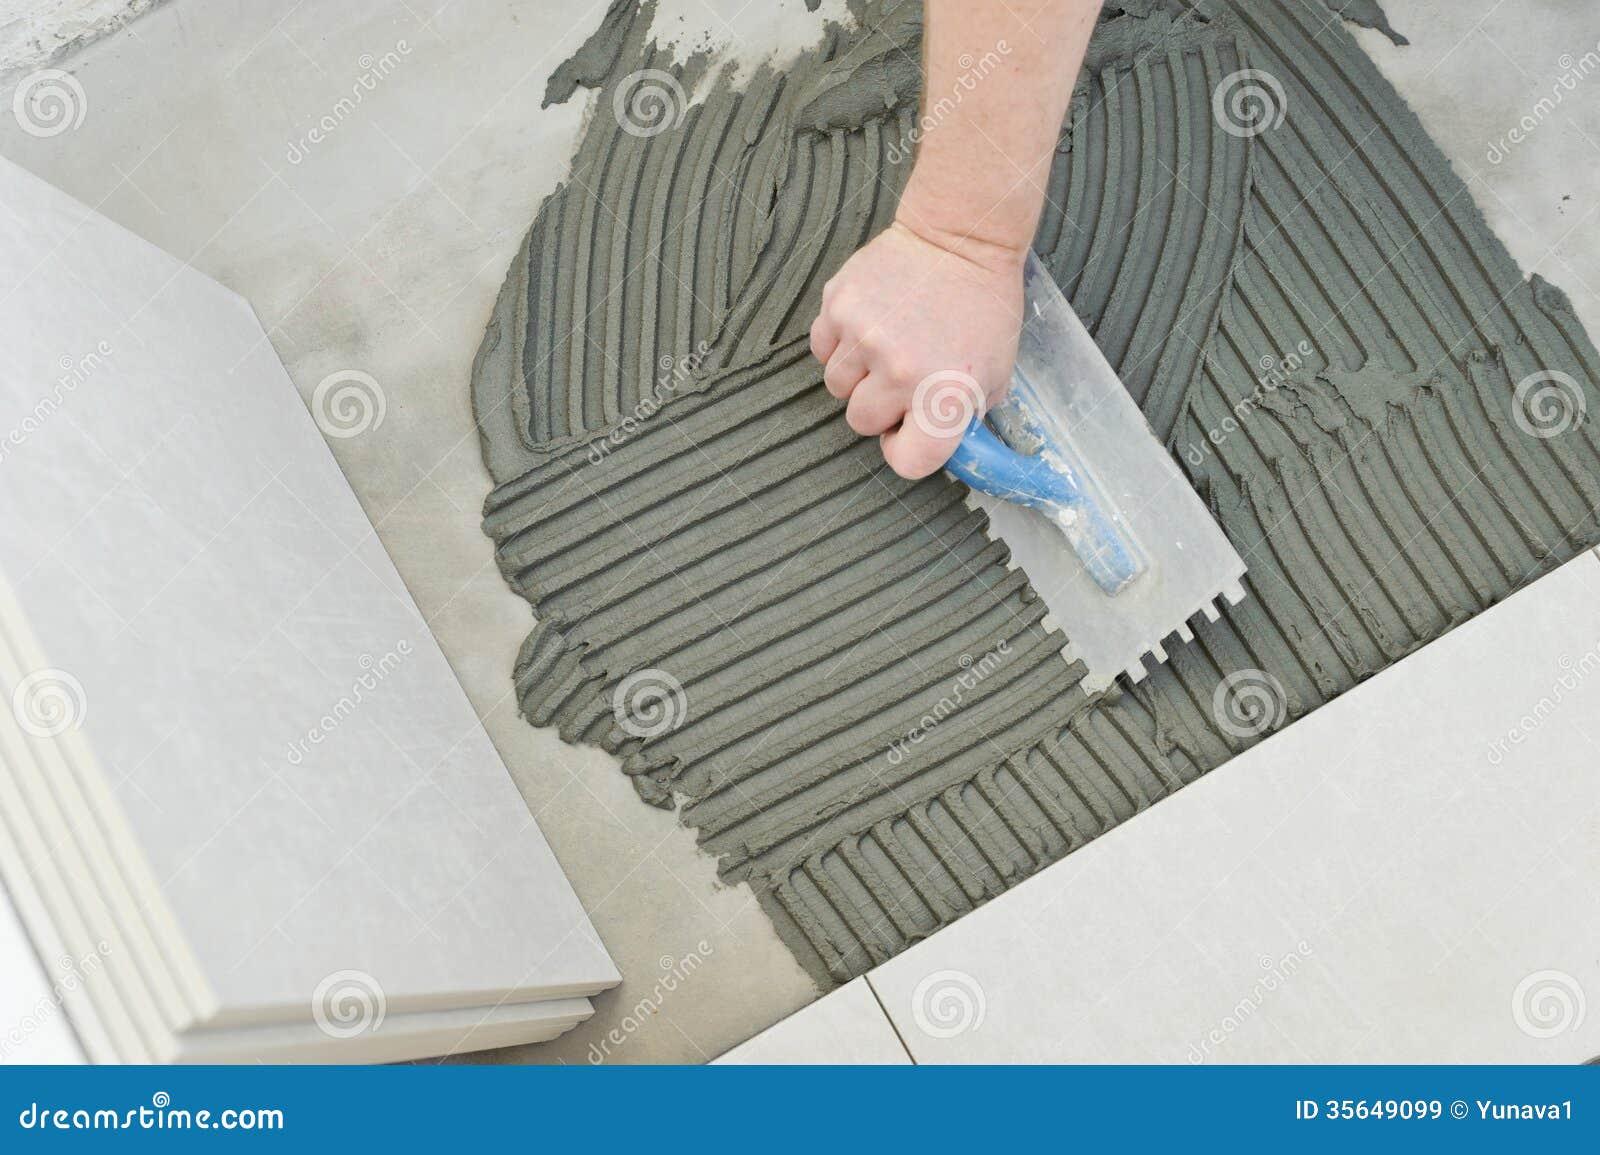 Filename: Laying Ceramic Tiles Troweling Mortar Onto Concrete Floor  Preparation White Floor Tile 35649099